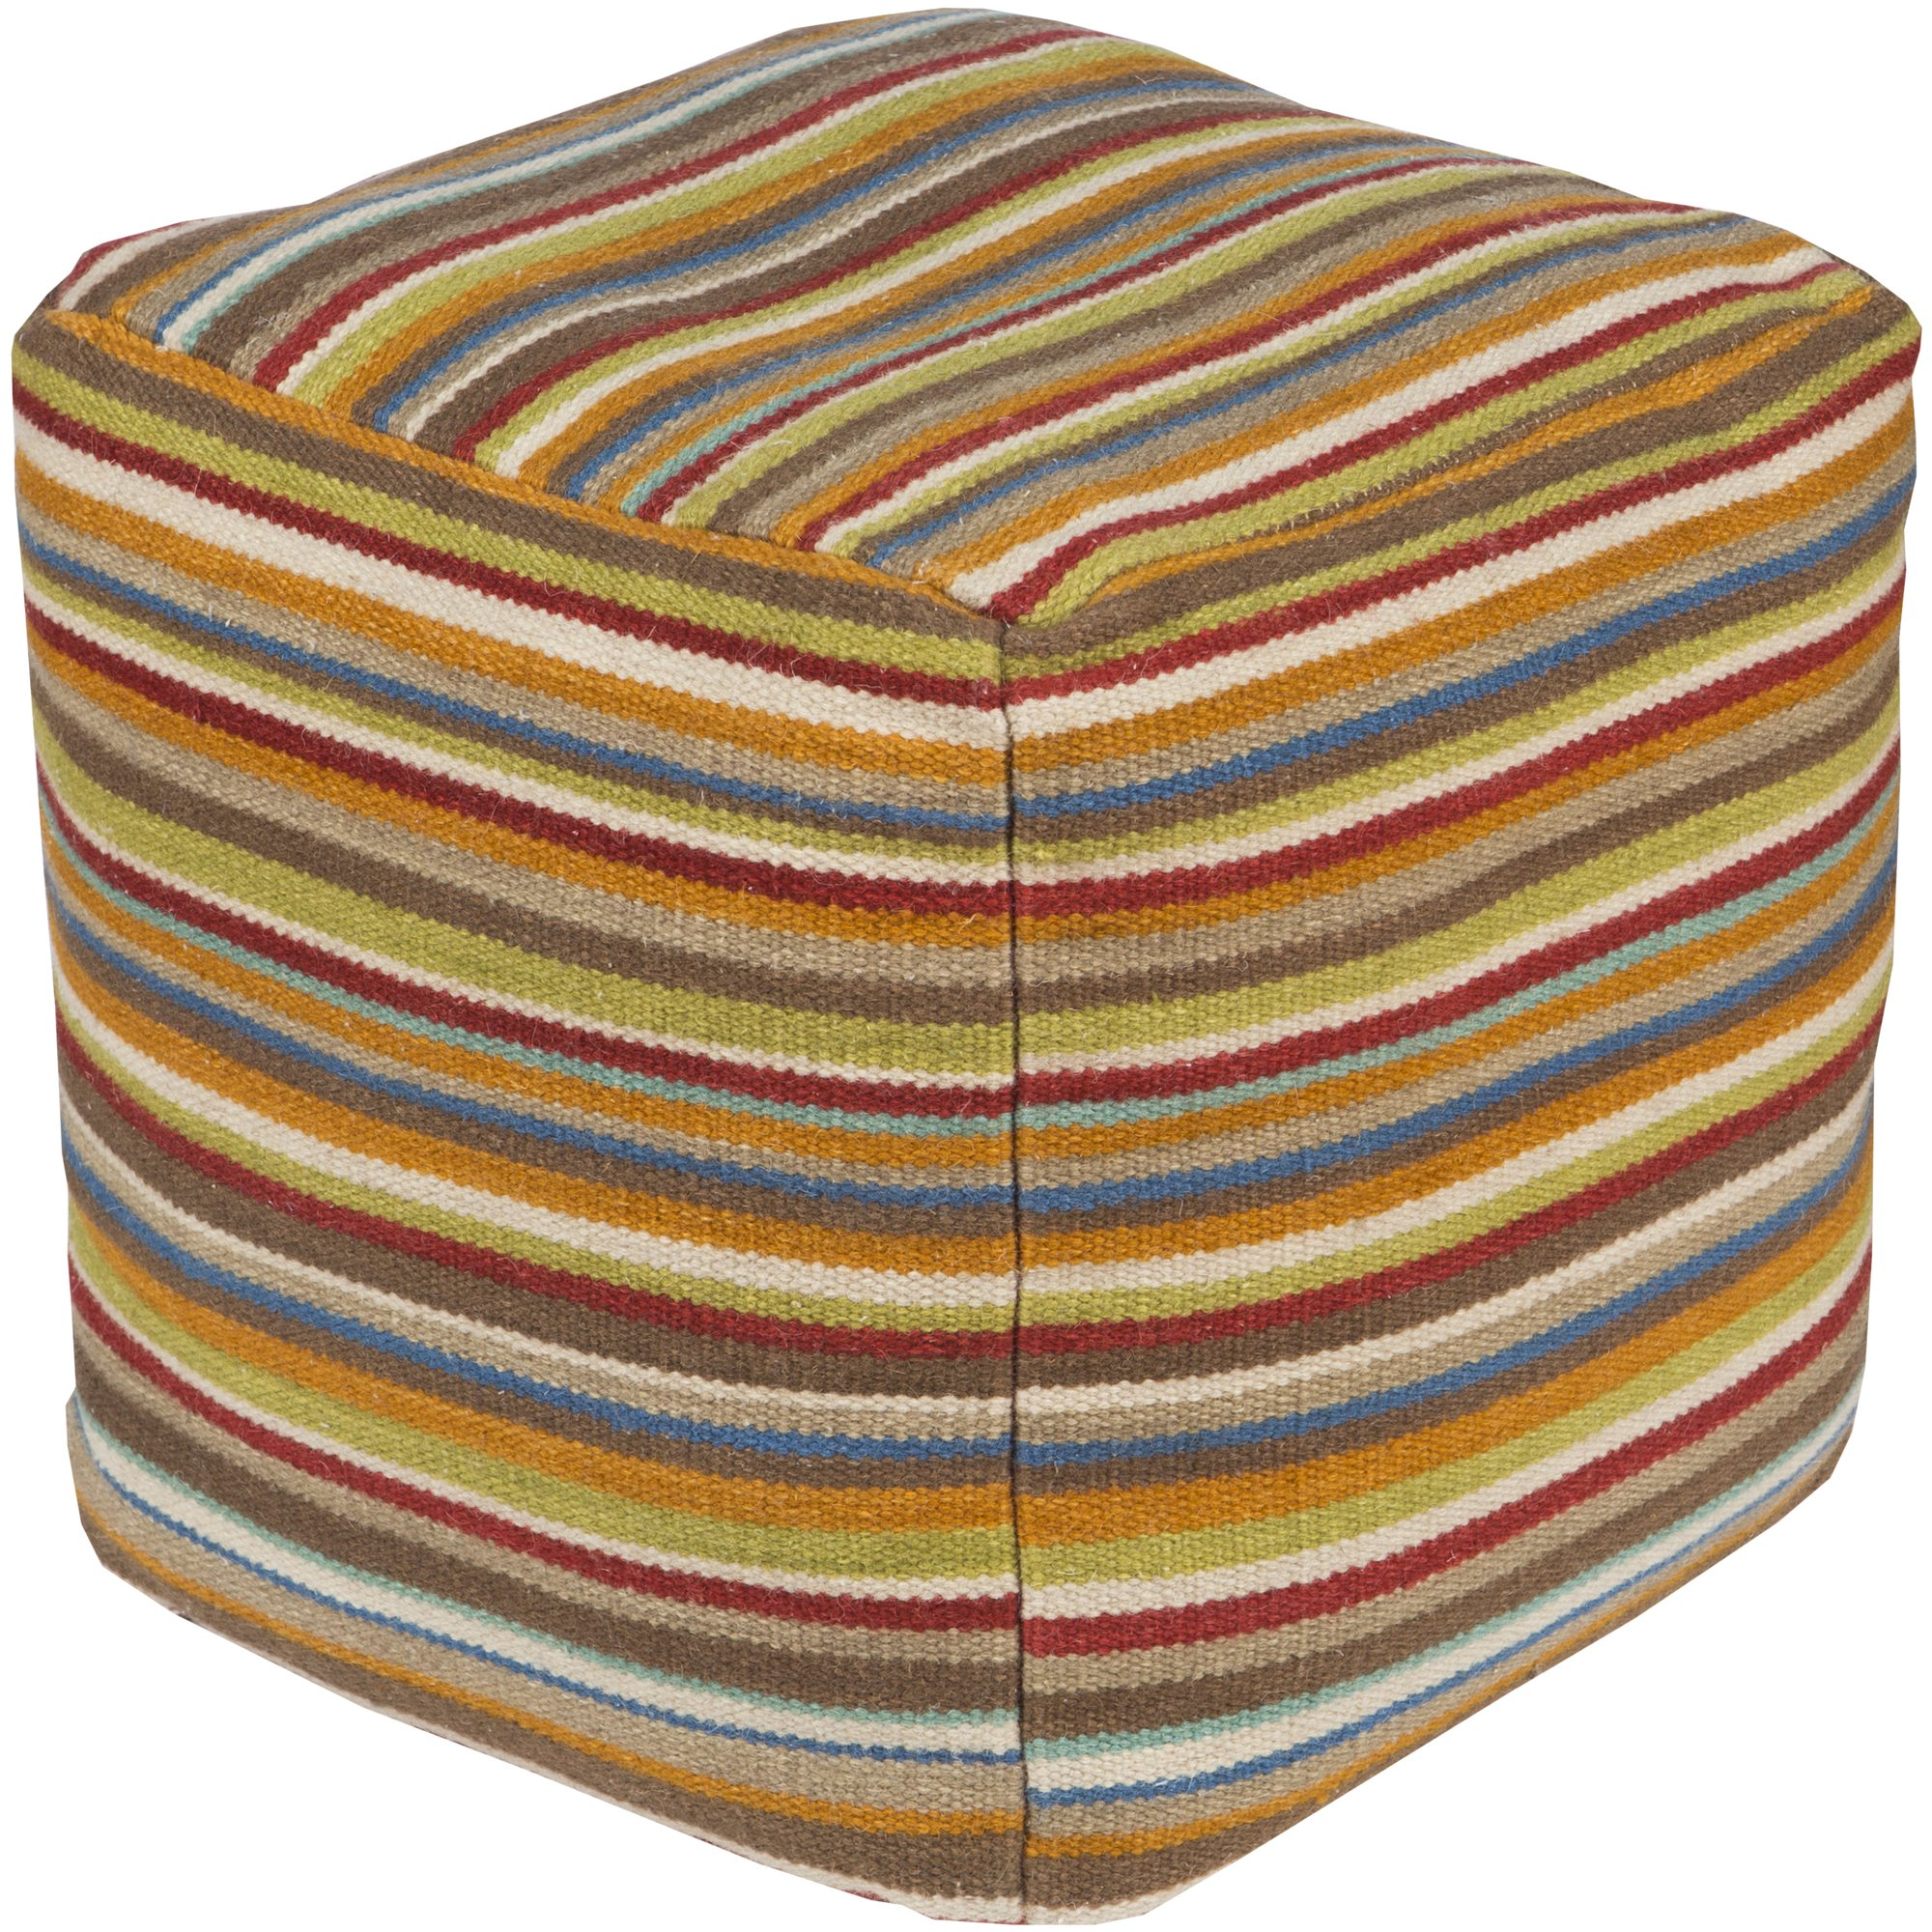 Surya POUF-149 Hand Made 80% Wool, 20% Cotton Venetian Red 18'' x 18'' Pouf